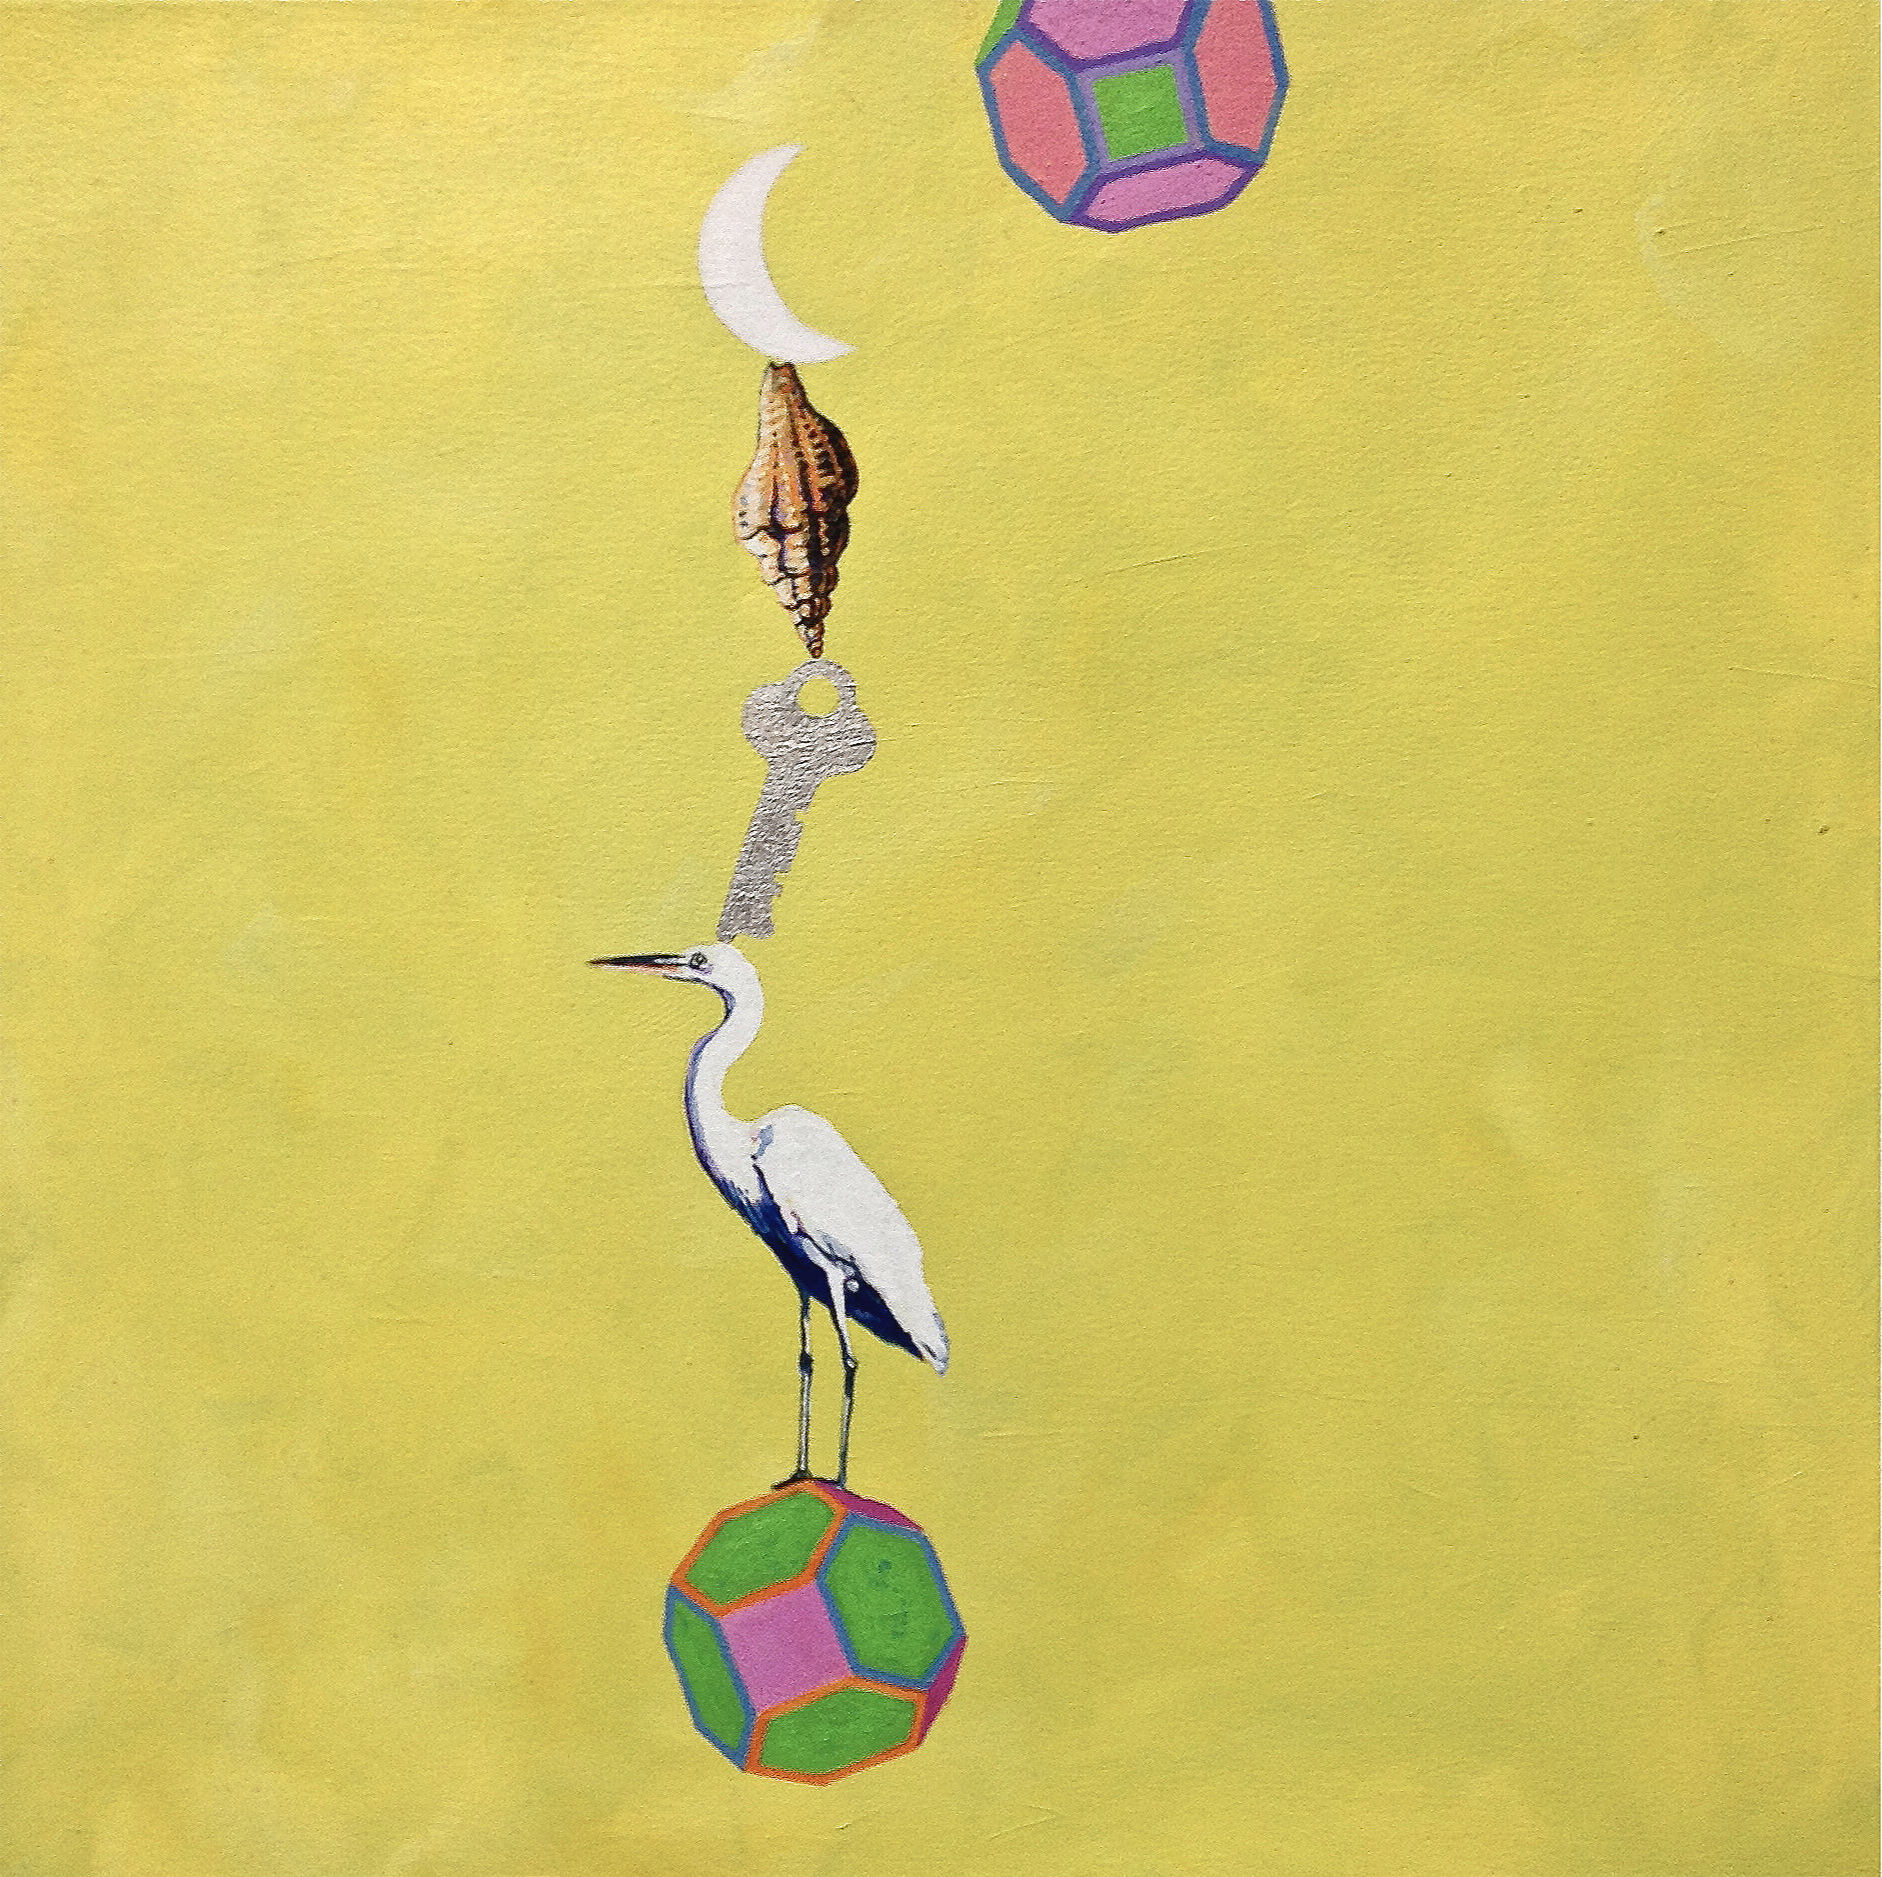 A Delicate Balance, 2015